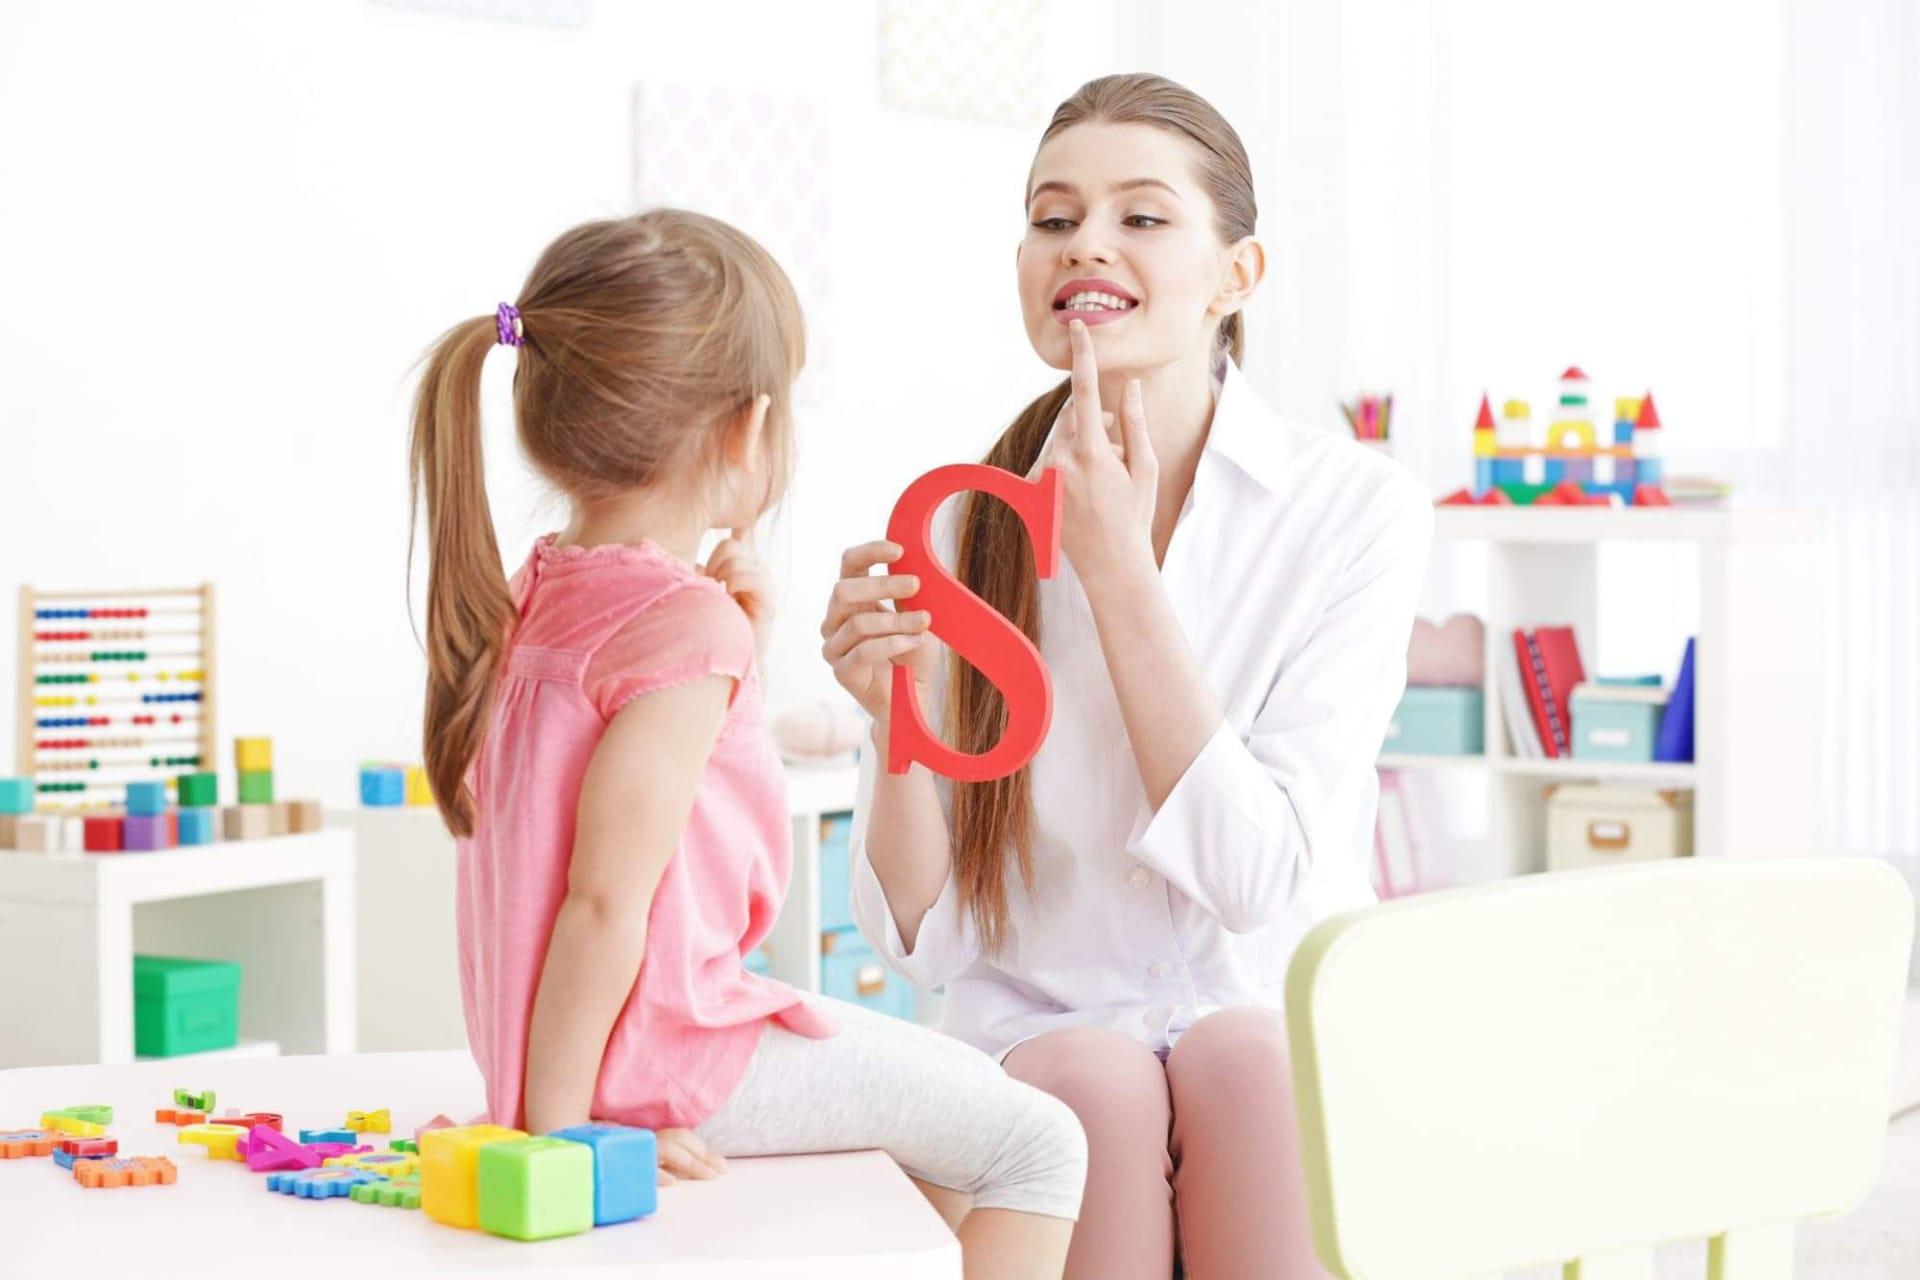 ReConstruir - Psicologia & Desenvolvimento Pessoal - Terapia da Fala